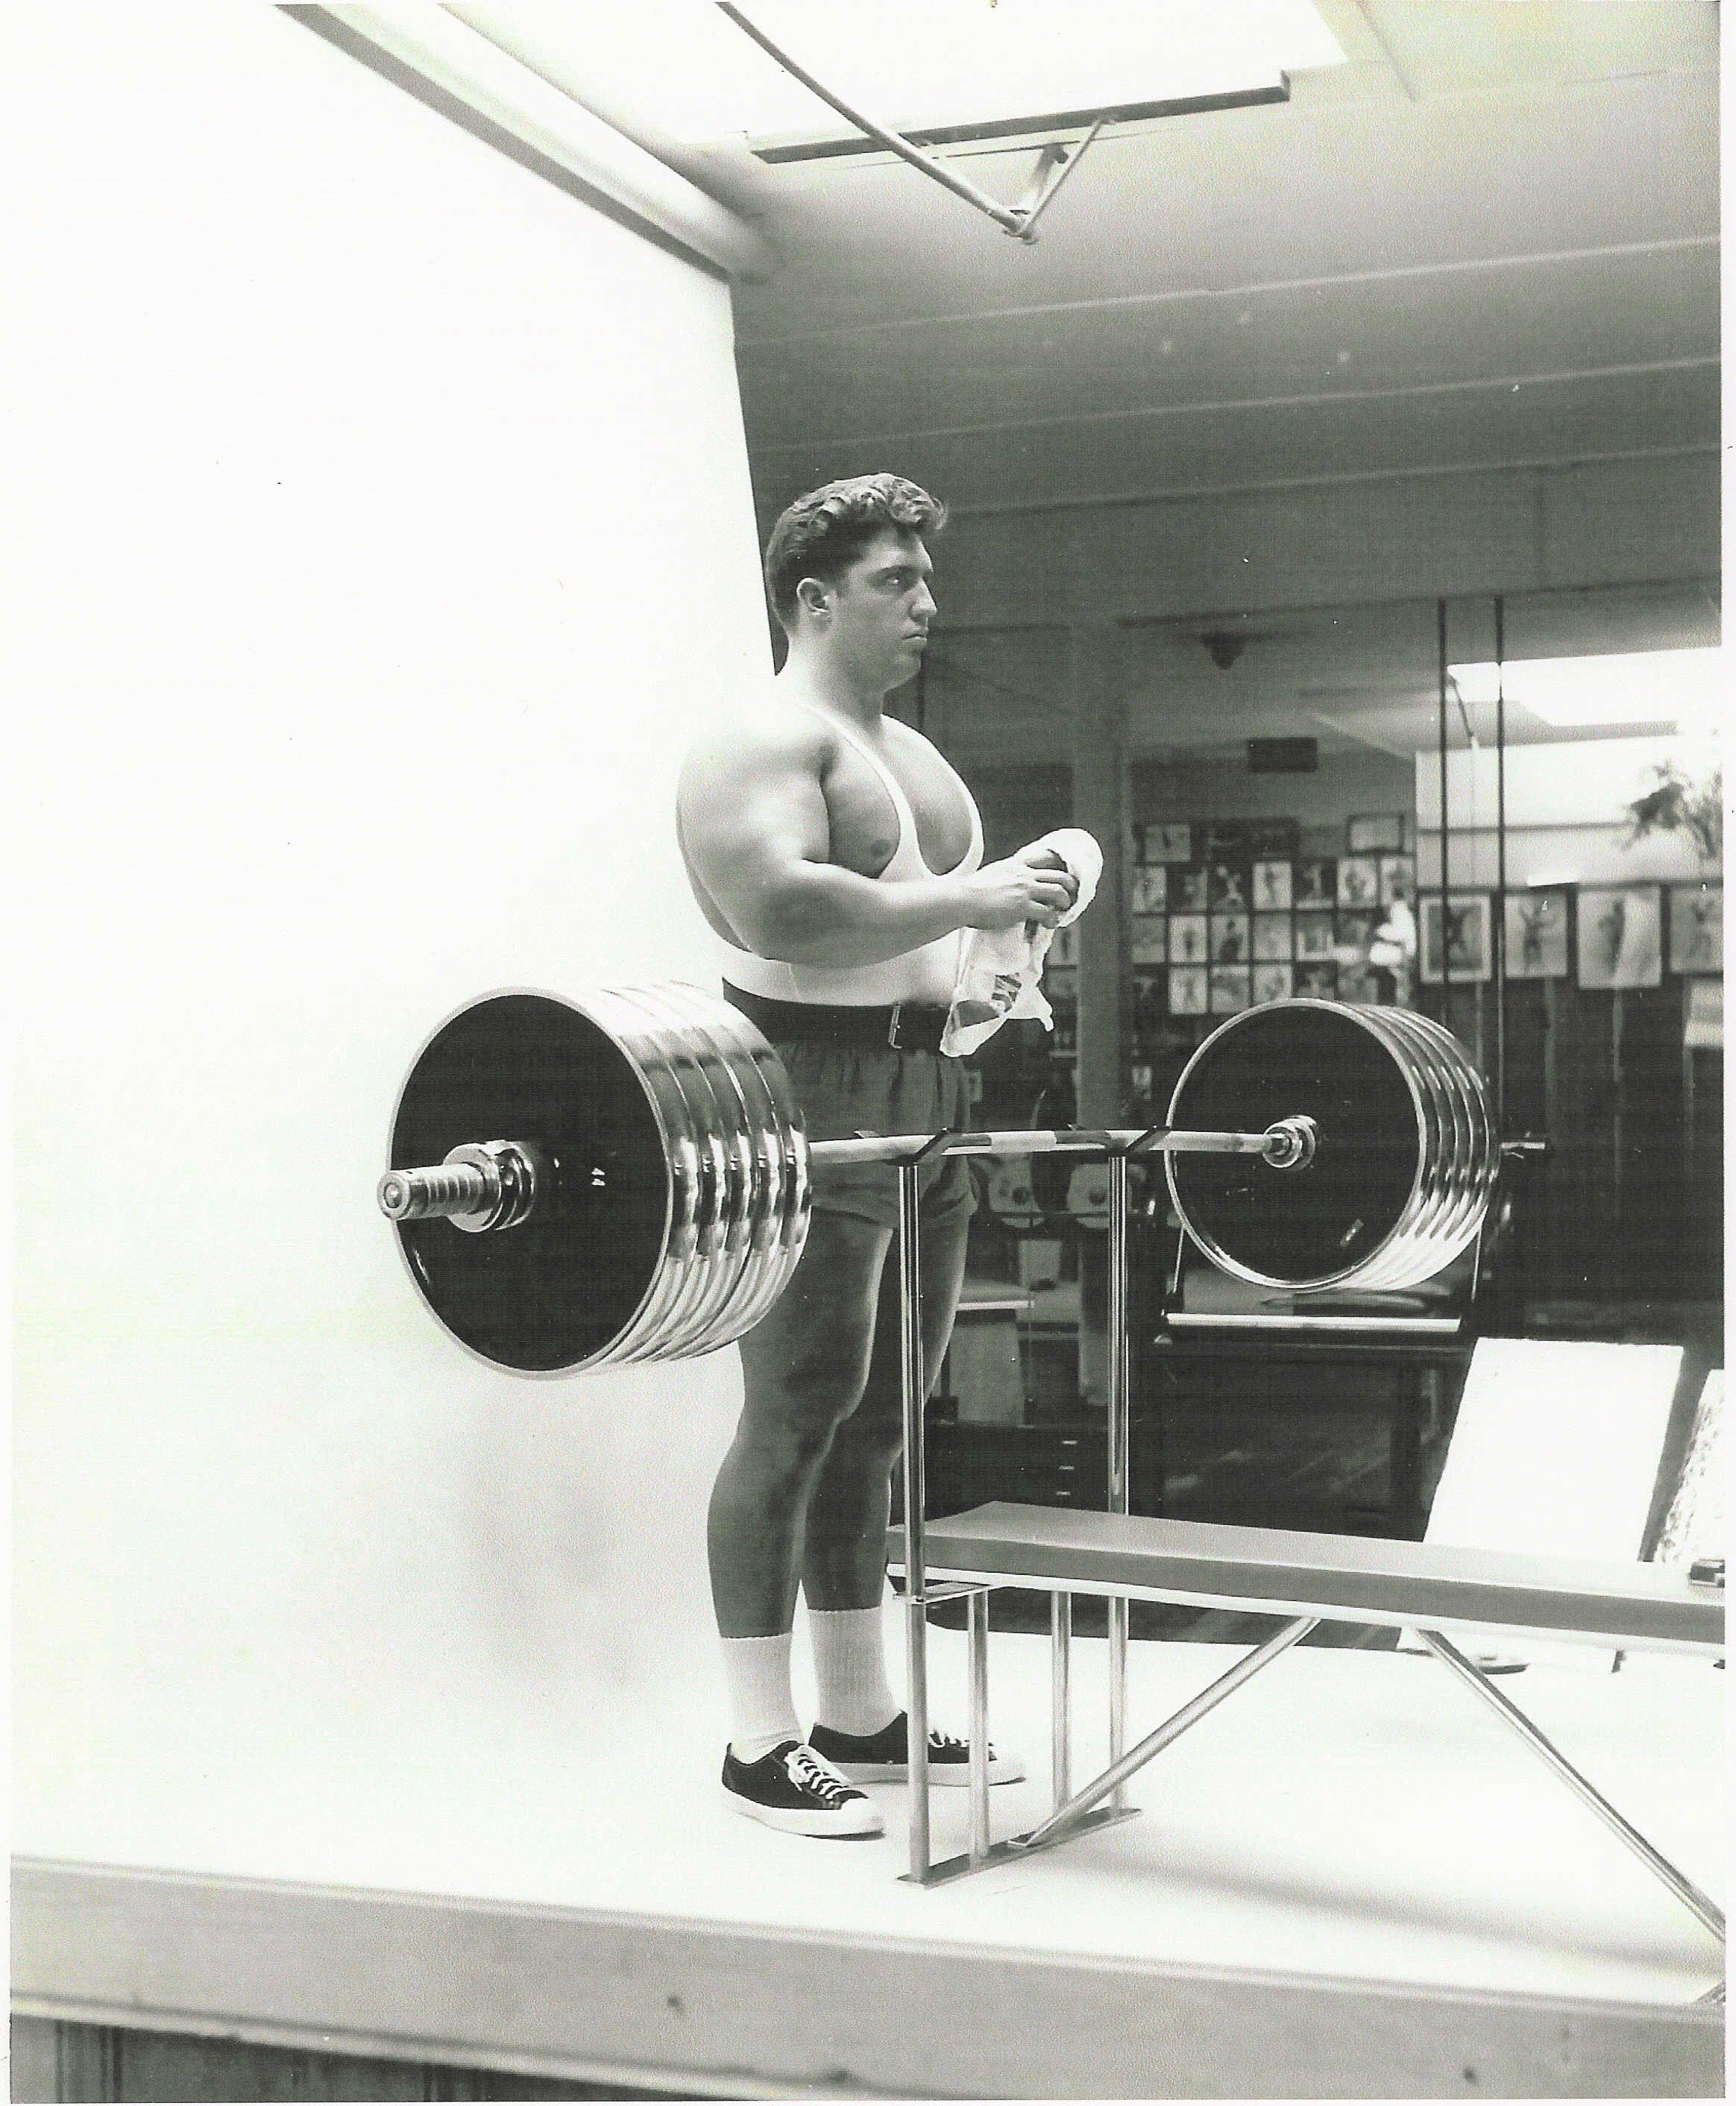 Pat Casey The First Man To Bench Press 600 Lbs Bench Press Powerlifting Muscular Development